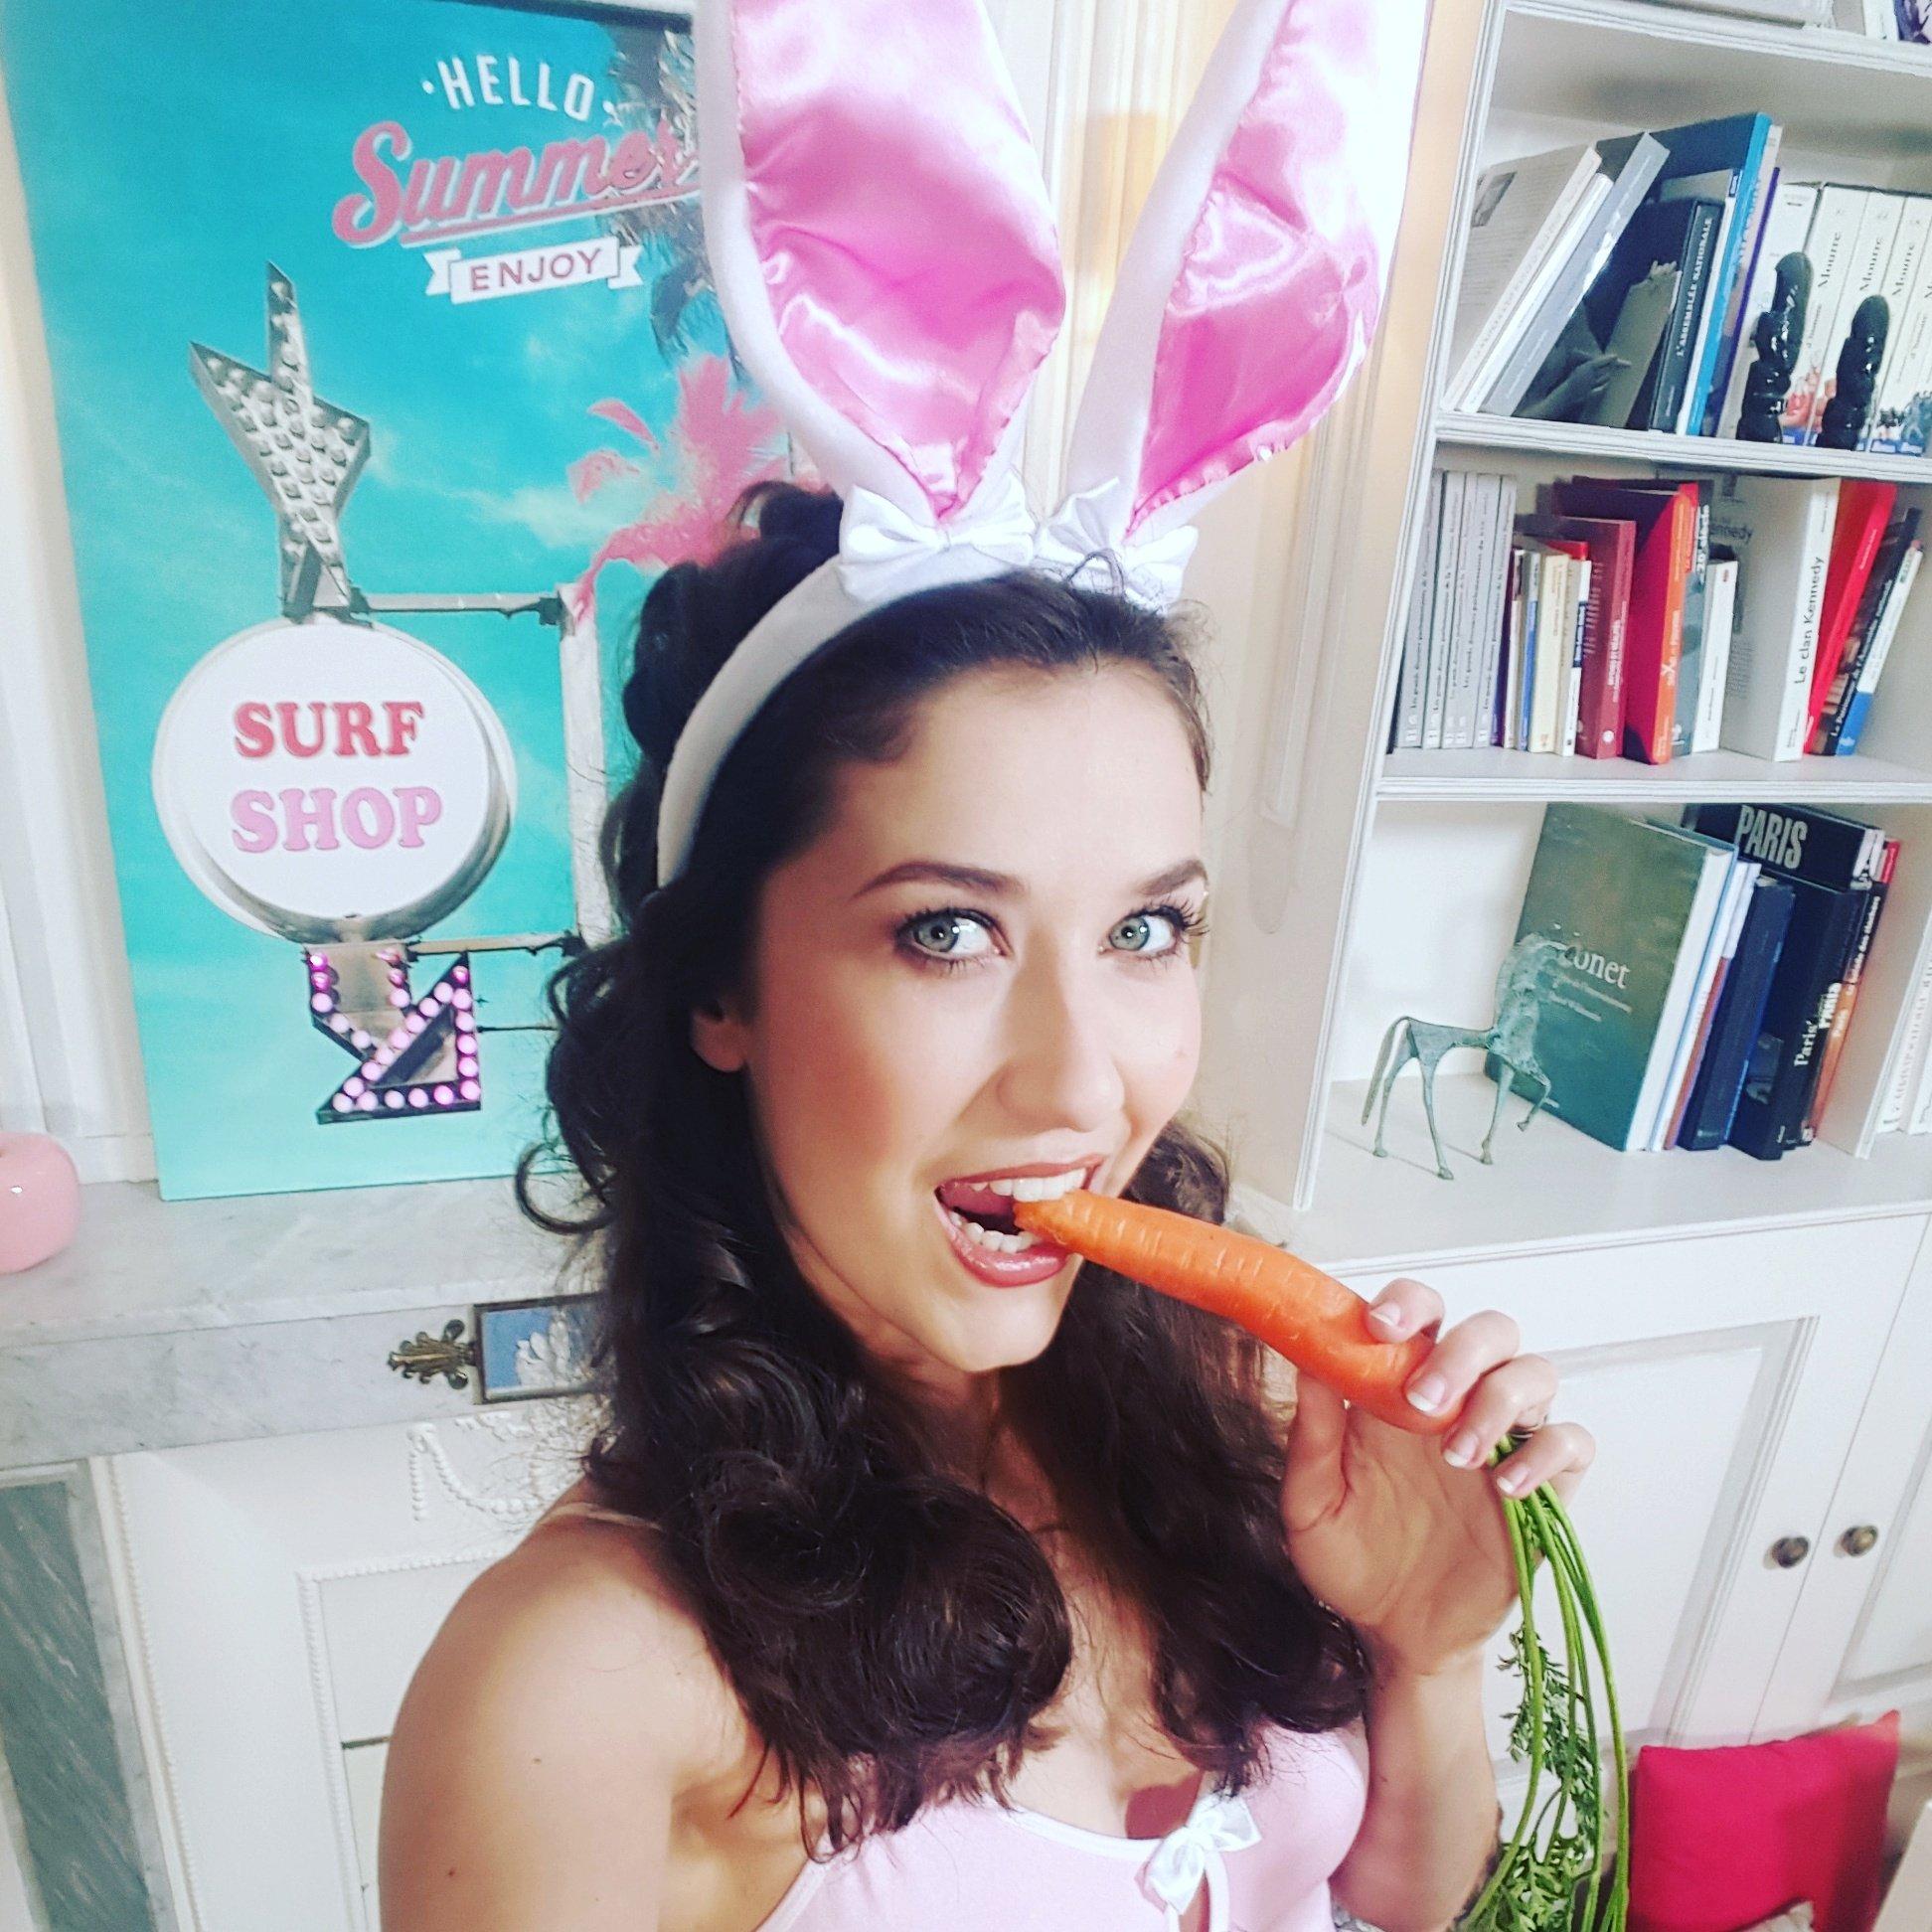 "Nephael Nephael: Nephael On Twitter: ""Euuuh Quoi De Neuf Docteur ? 😄 #bunny"